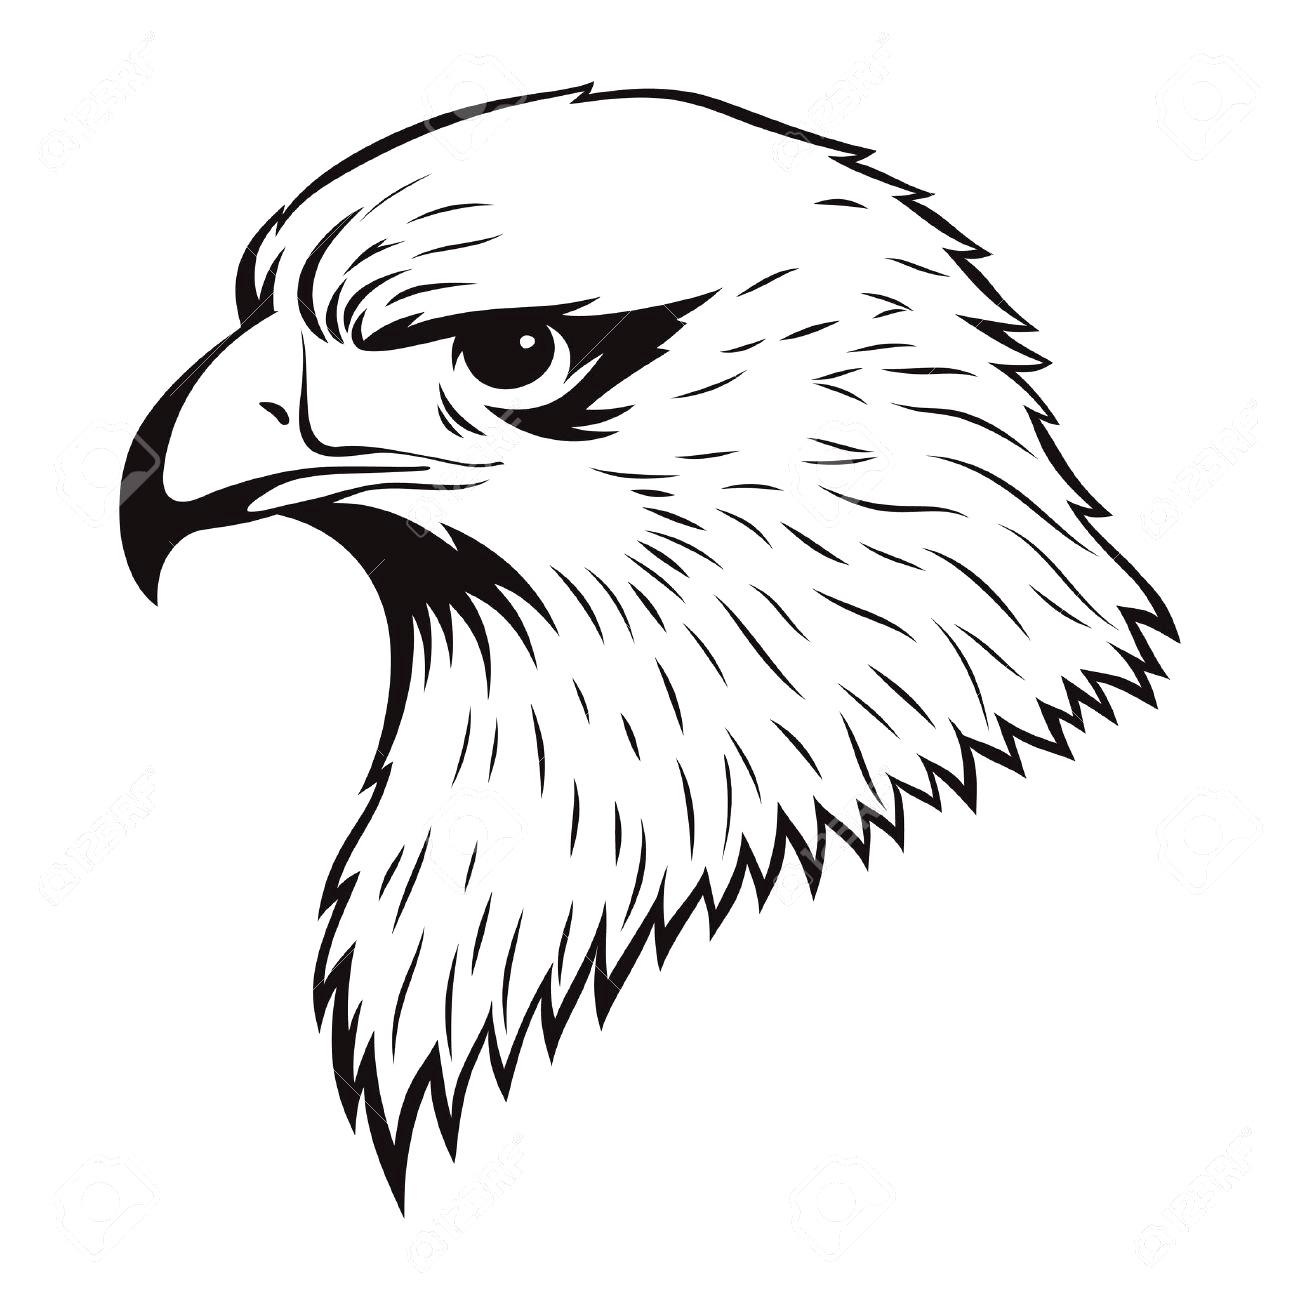 Eagle Drawings